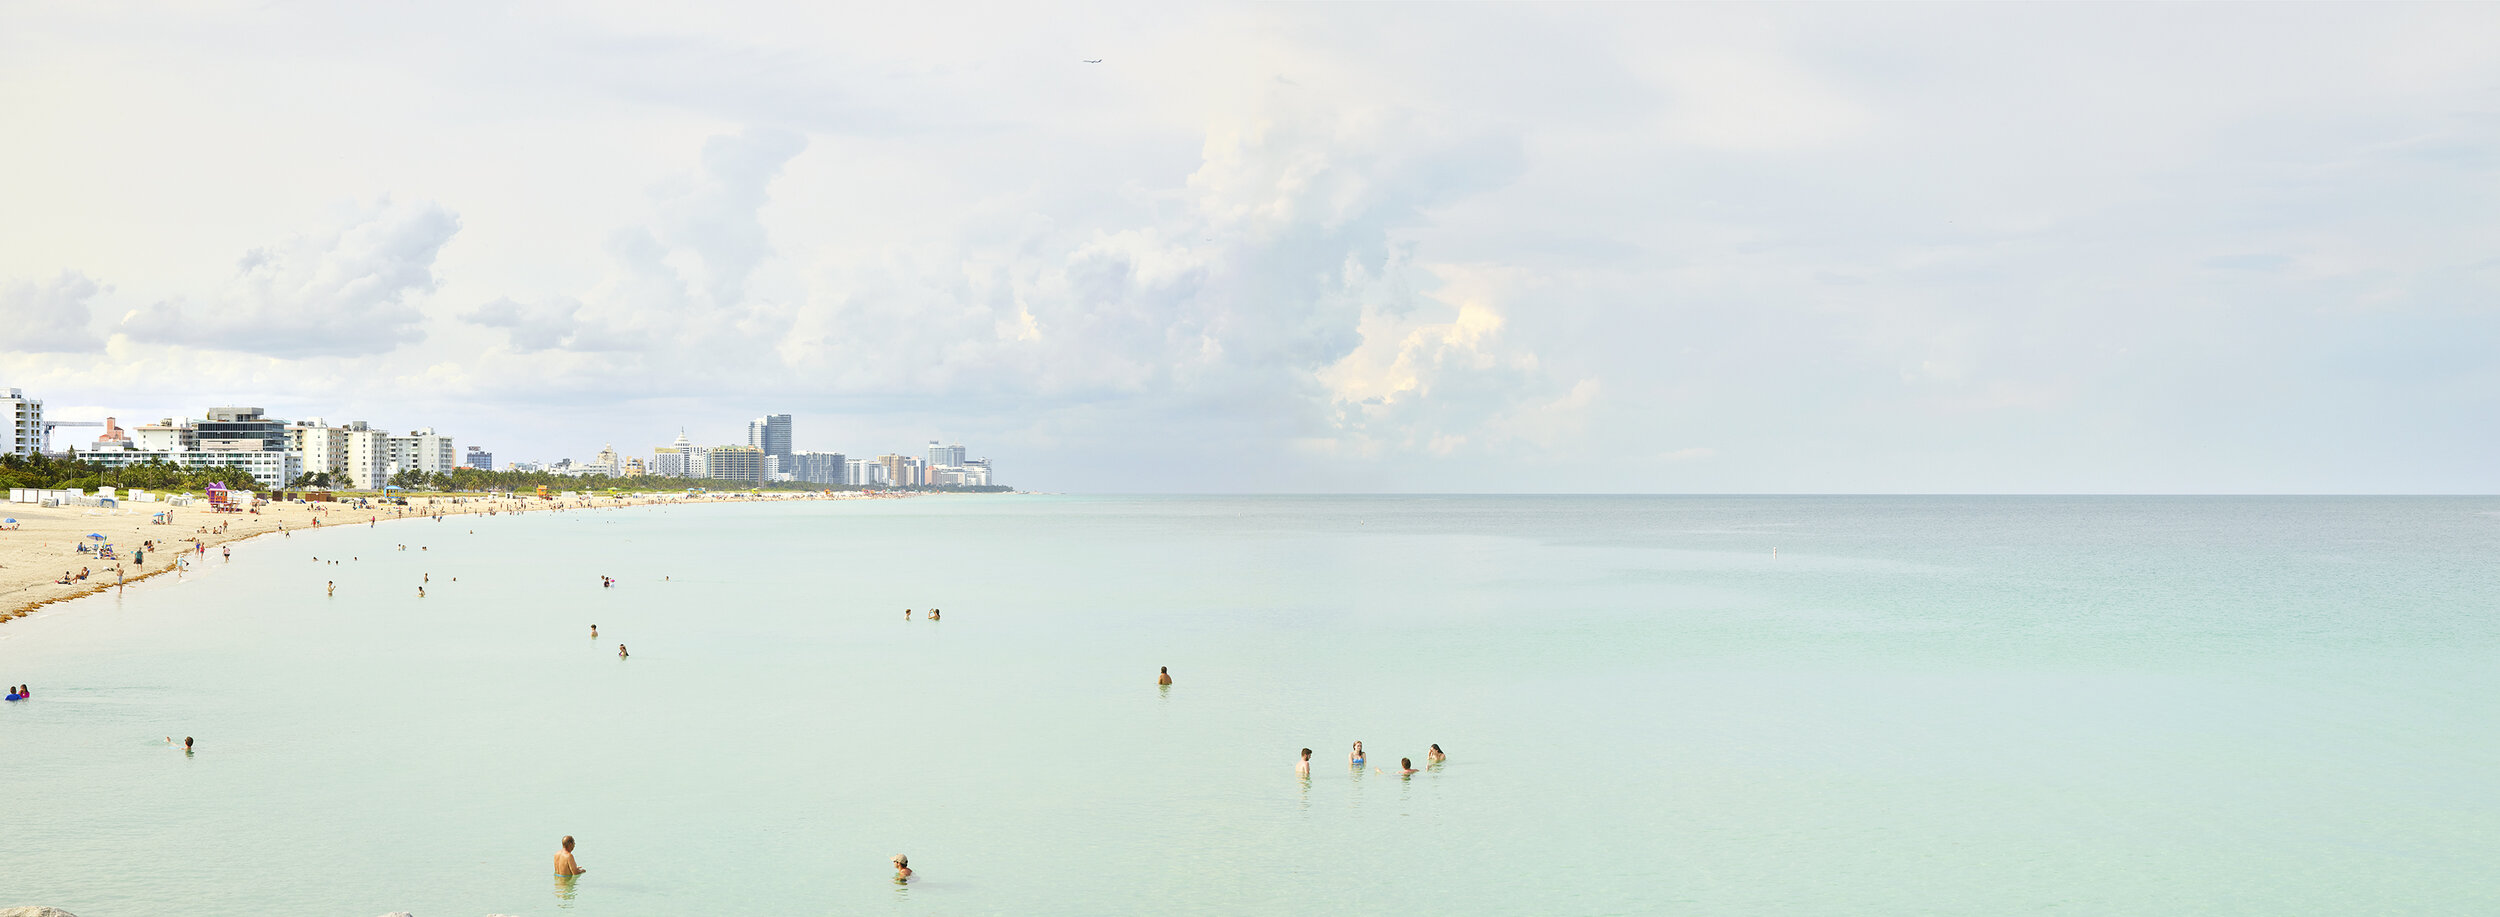 Gallery beach voyeur Nude Beach